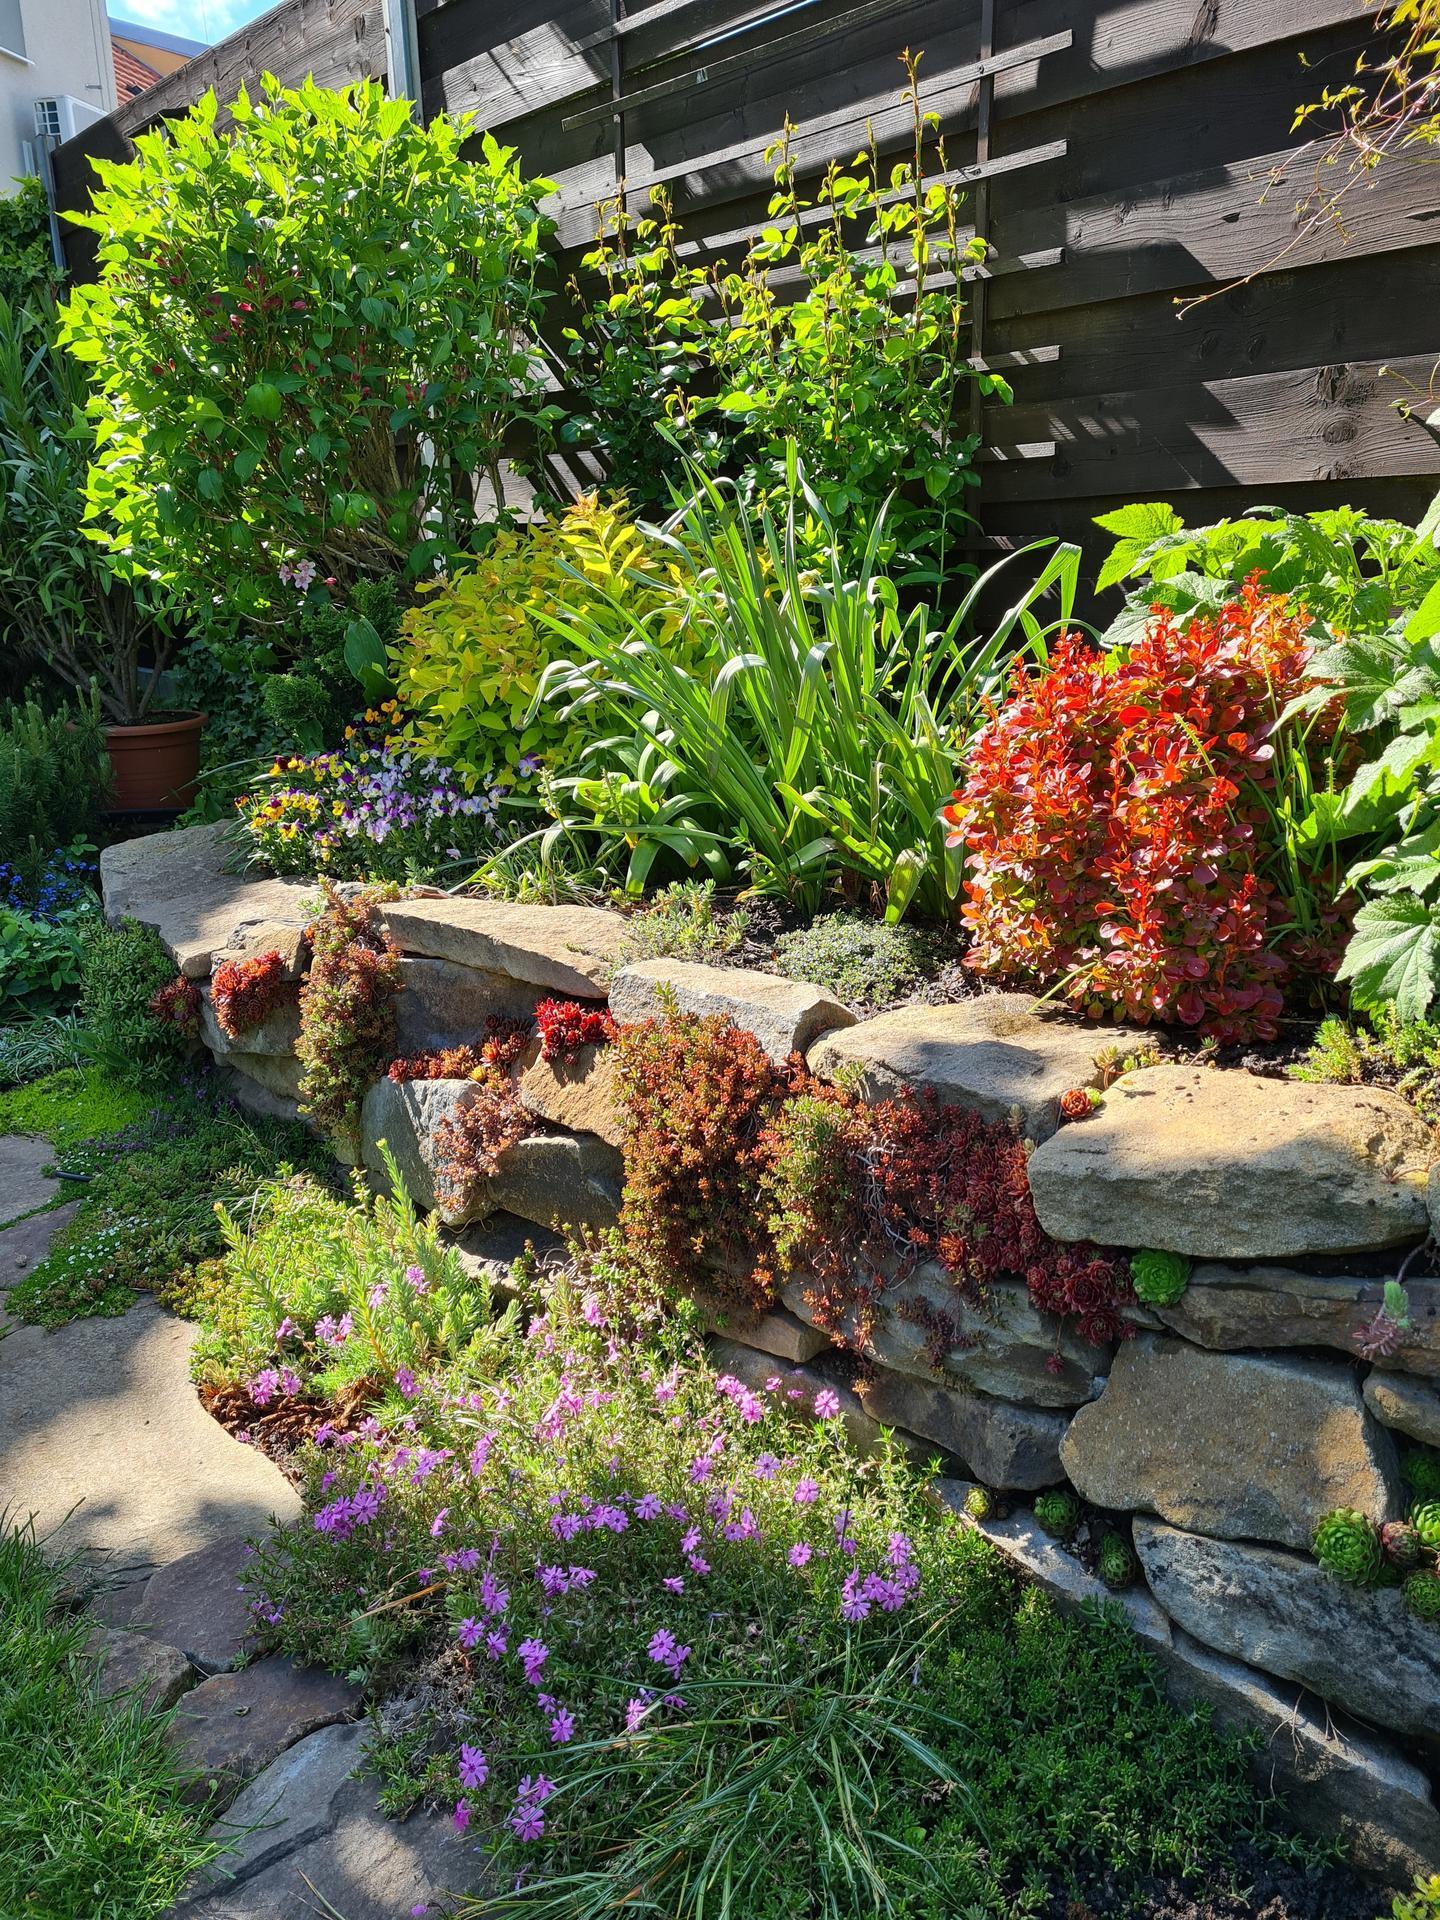 Naša záhradka 2021 - Obrázek č. 5